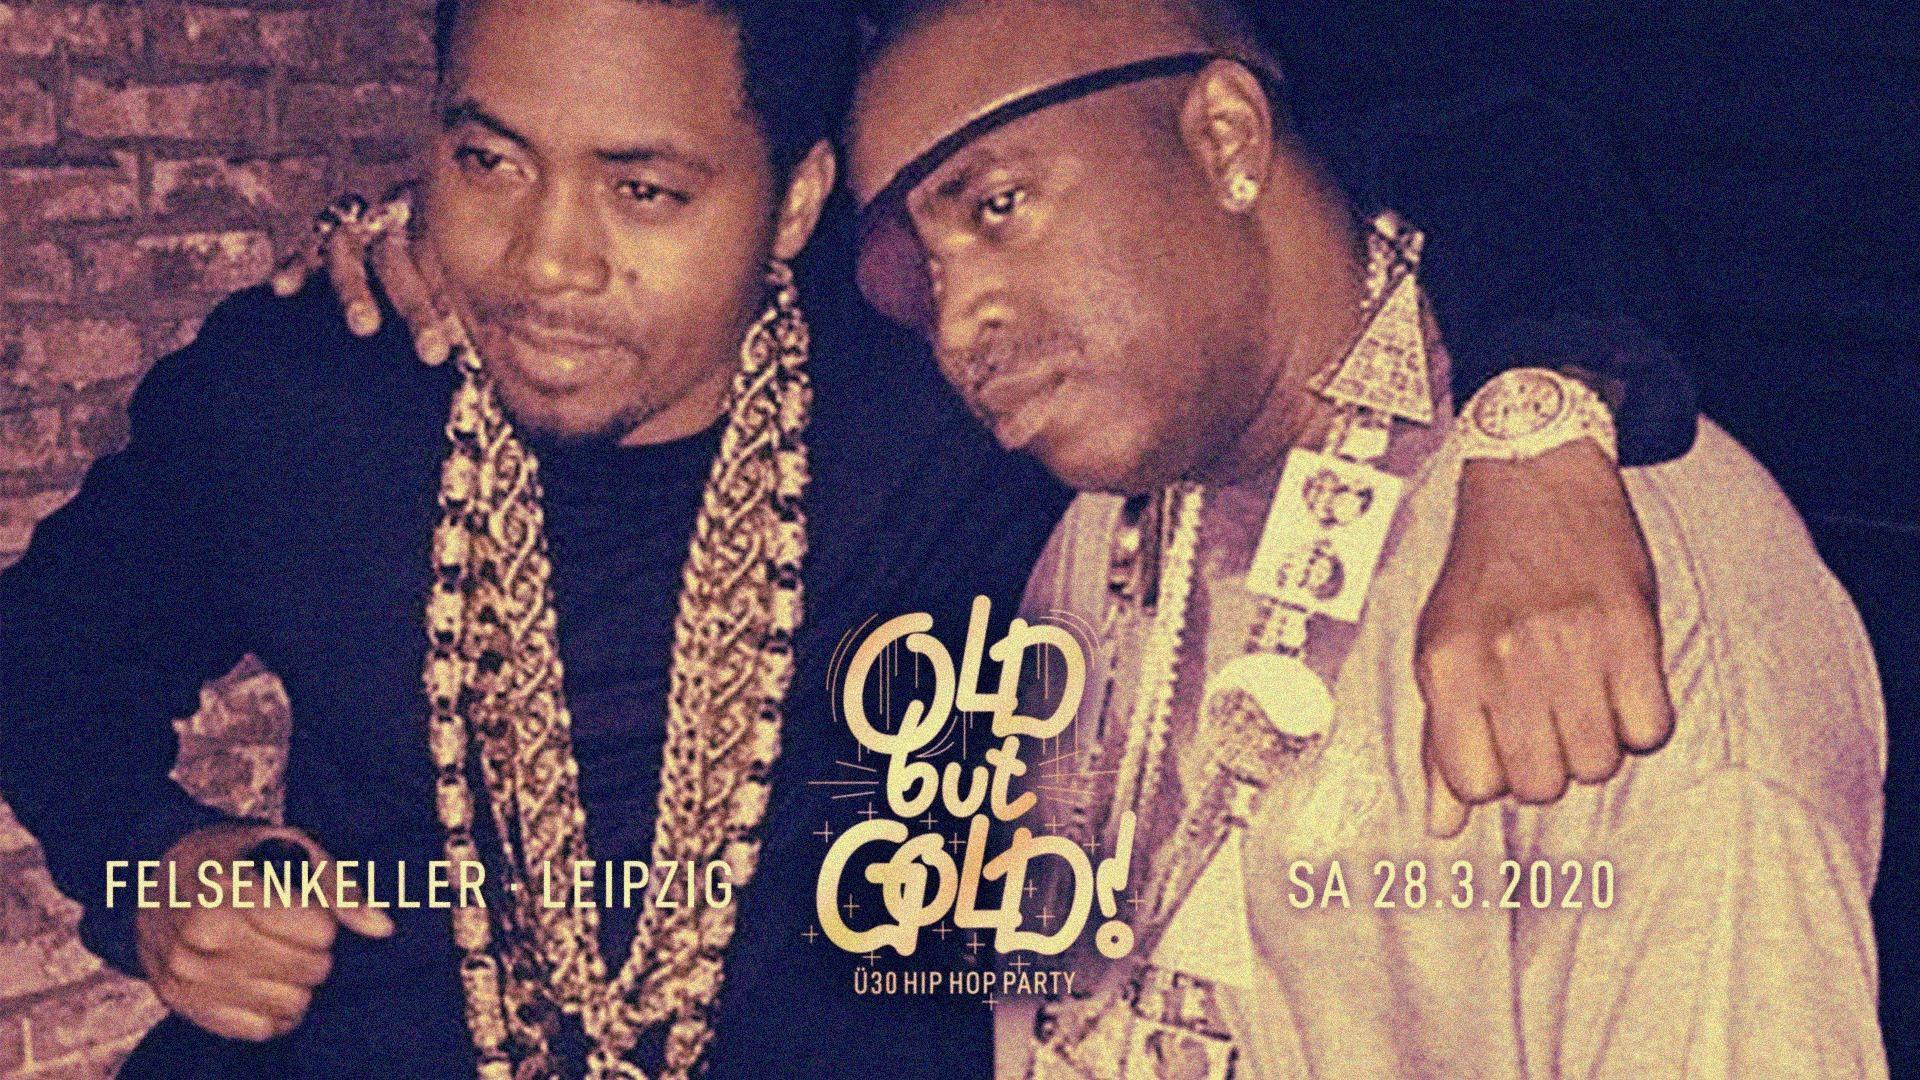 Old but Gold Party Ü30 Hip Hop Party